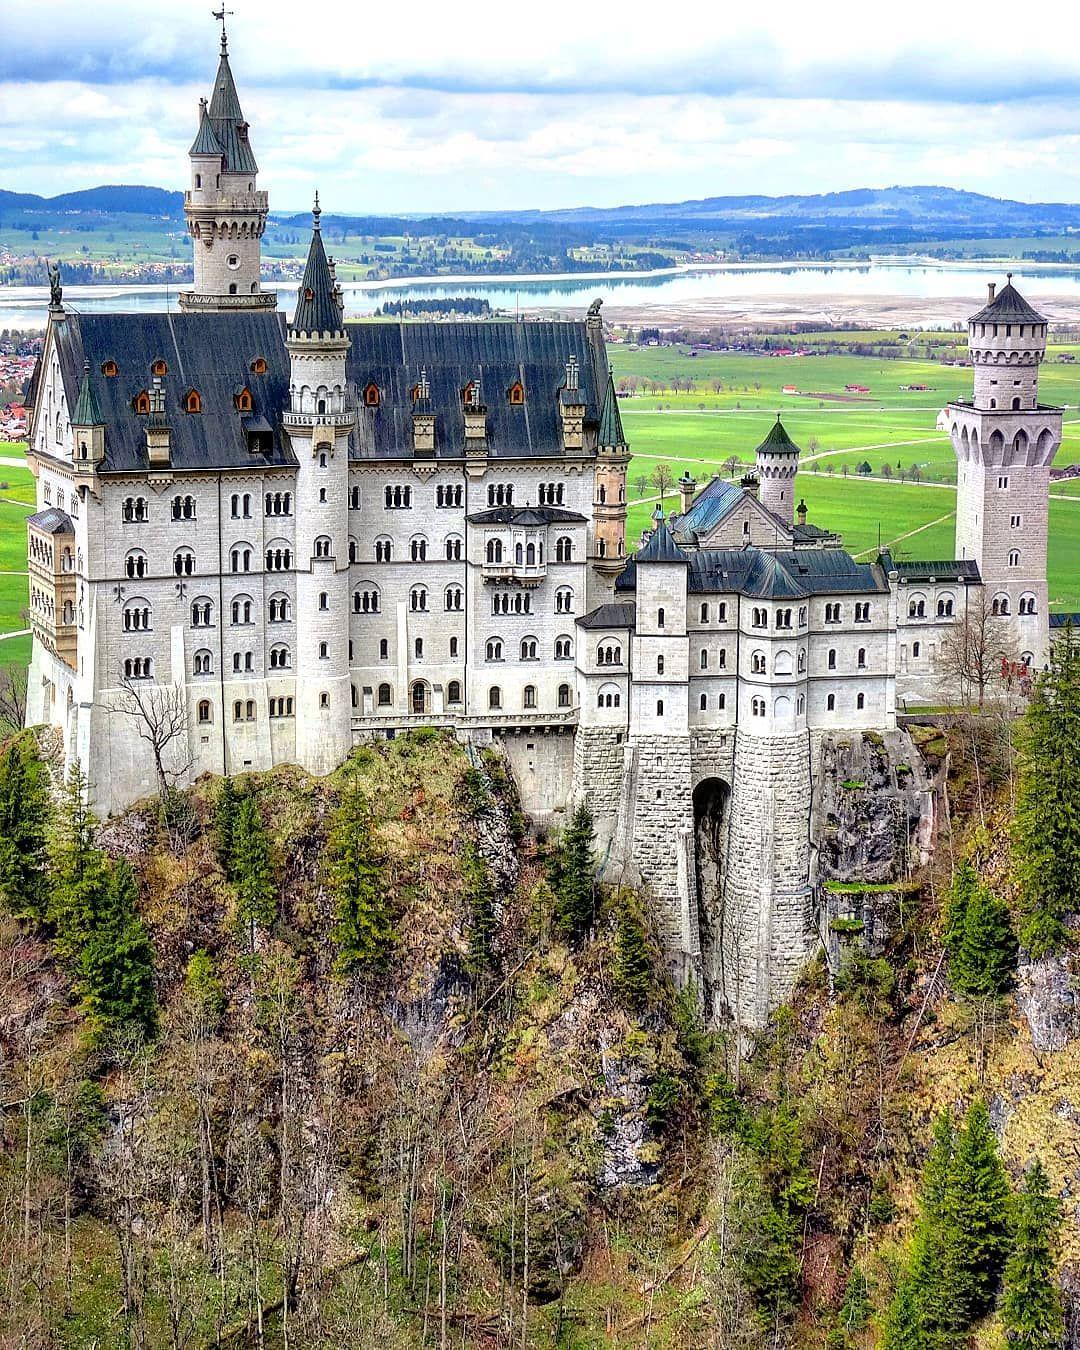 Nueschwanstein Castle Bavaria Germany Zamok Nojshvanshtajn Bavariya Germaniya Germany Castle Sc Zamok Nojshvanshtajn Bavariya Krasivye Mesta